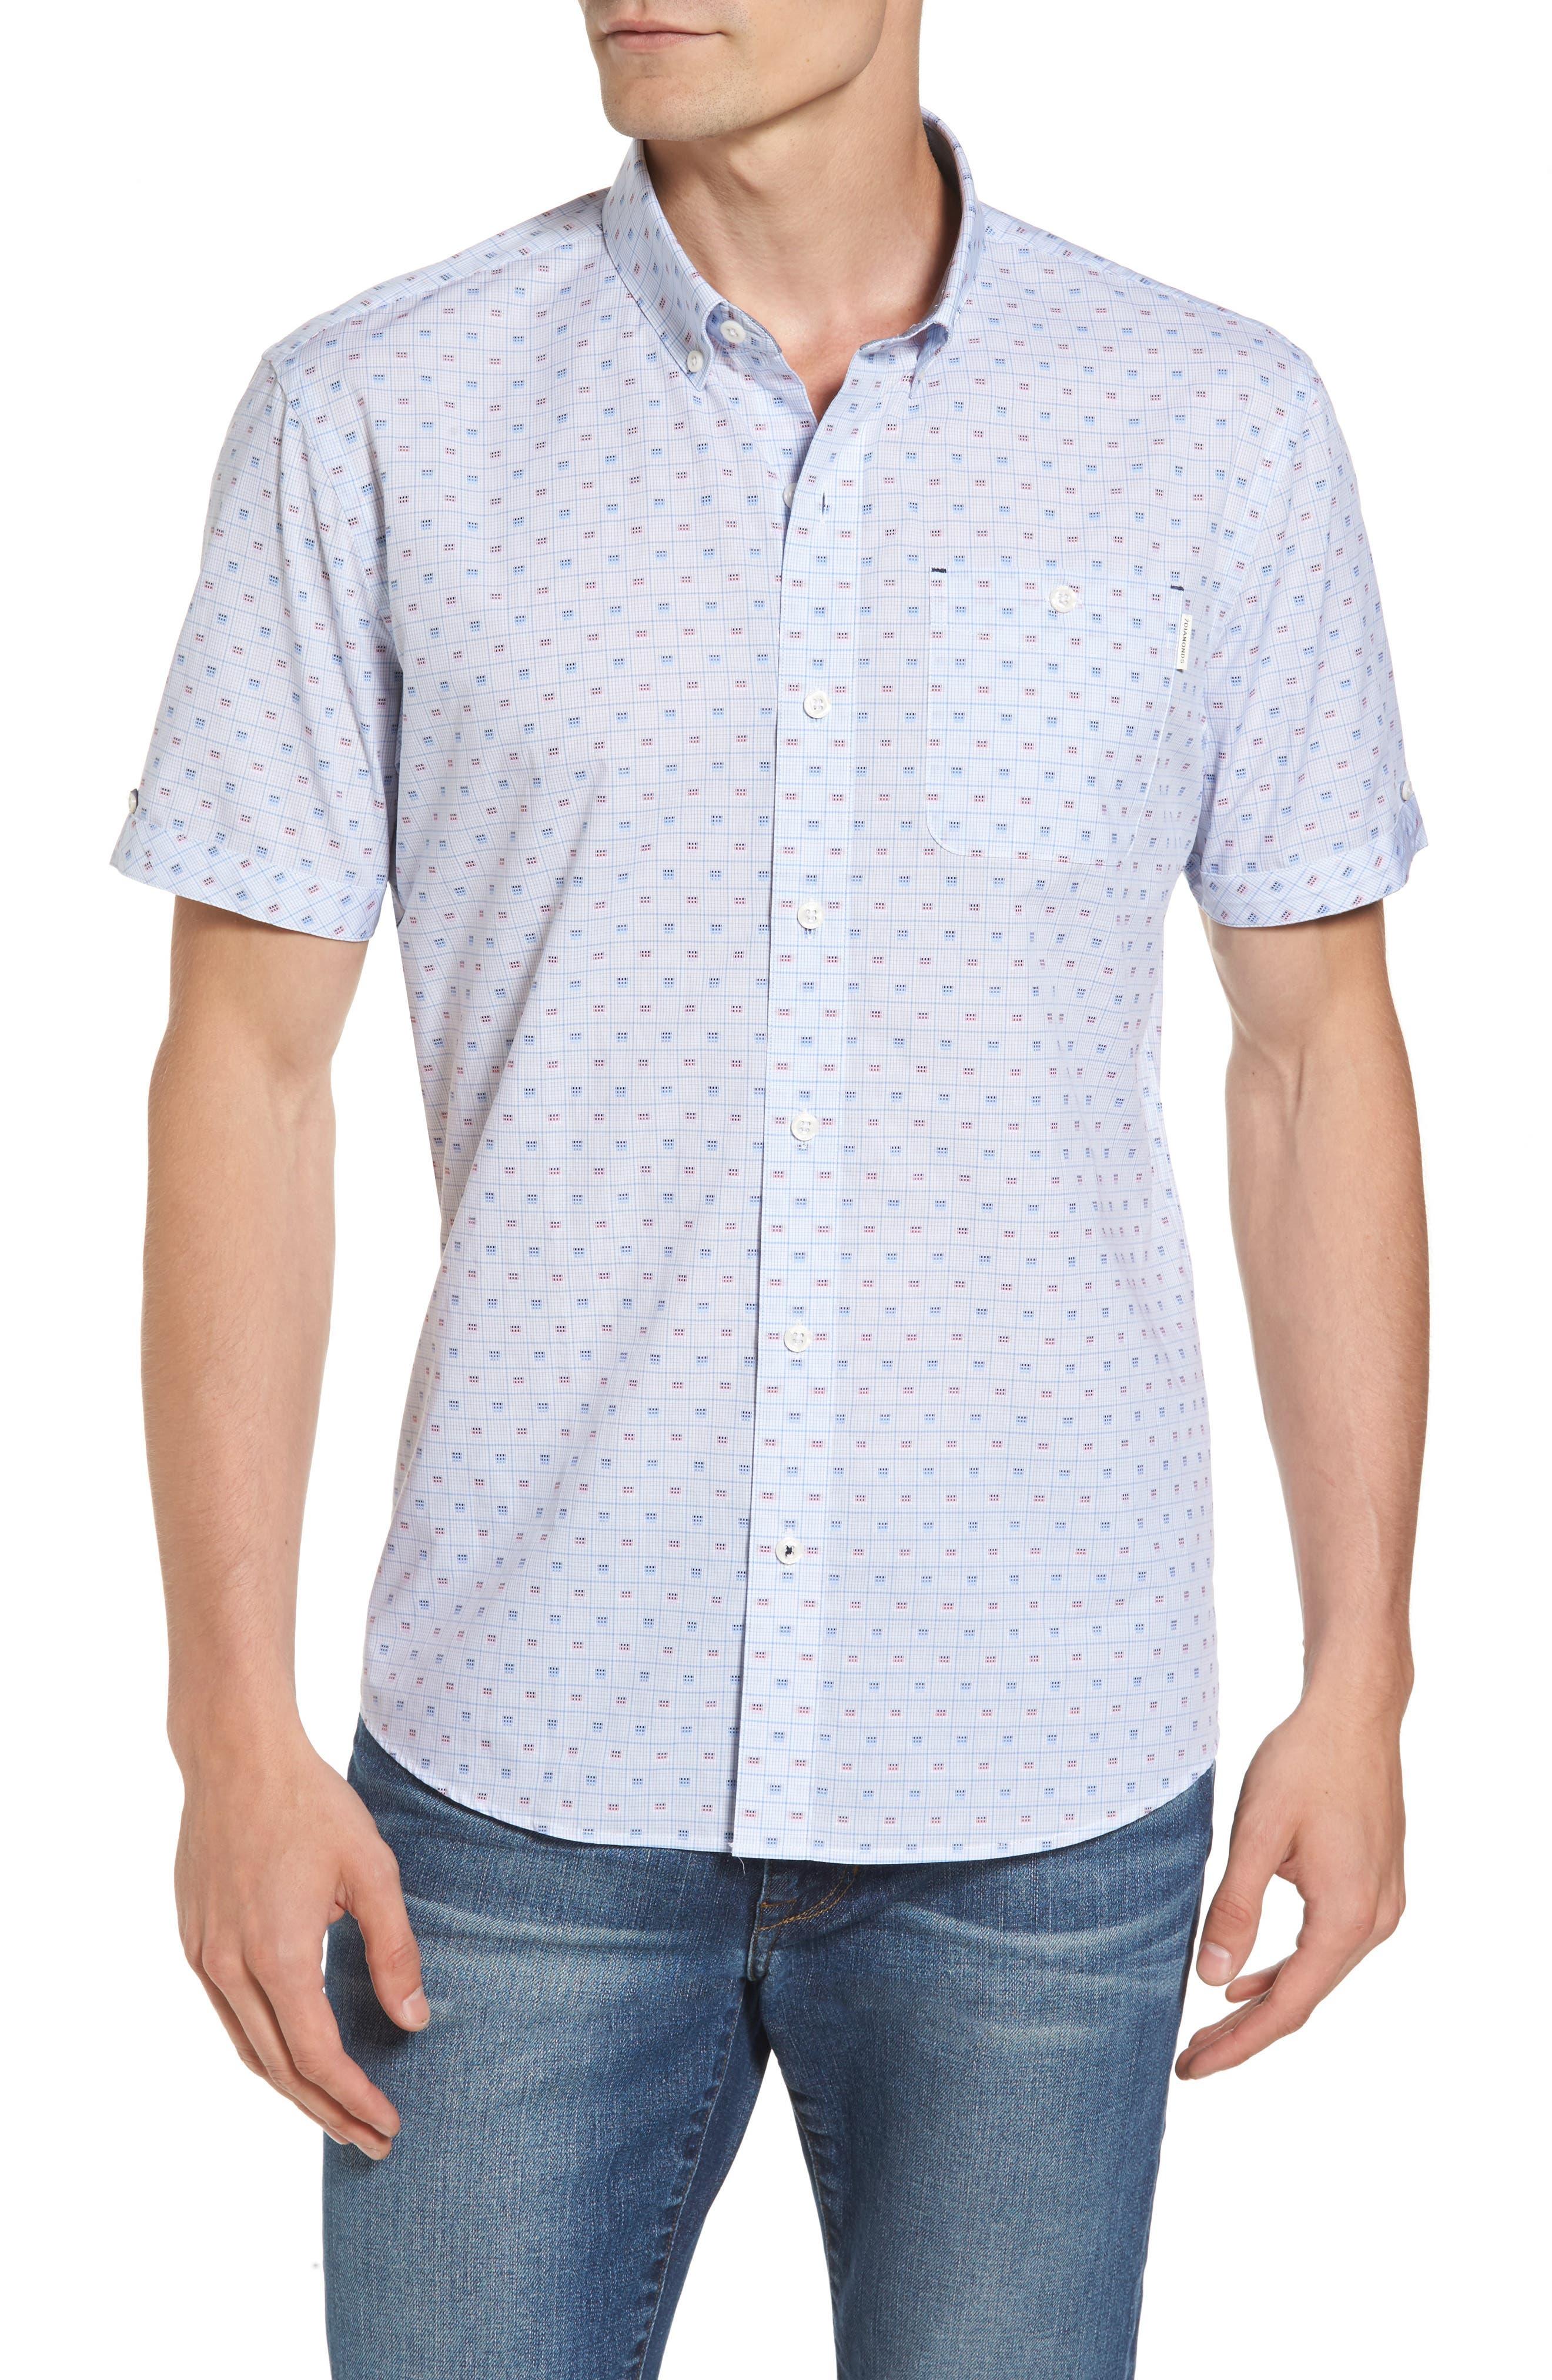 Atmosphere Woven Shirt,                         Main,                         color, Light Blue